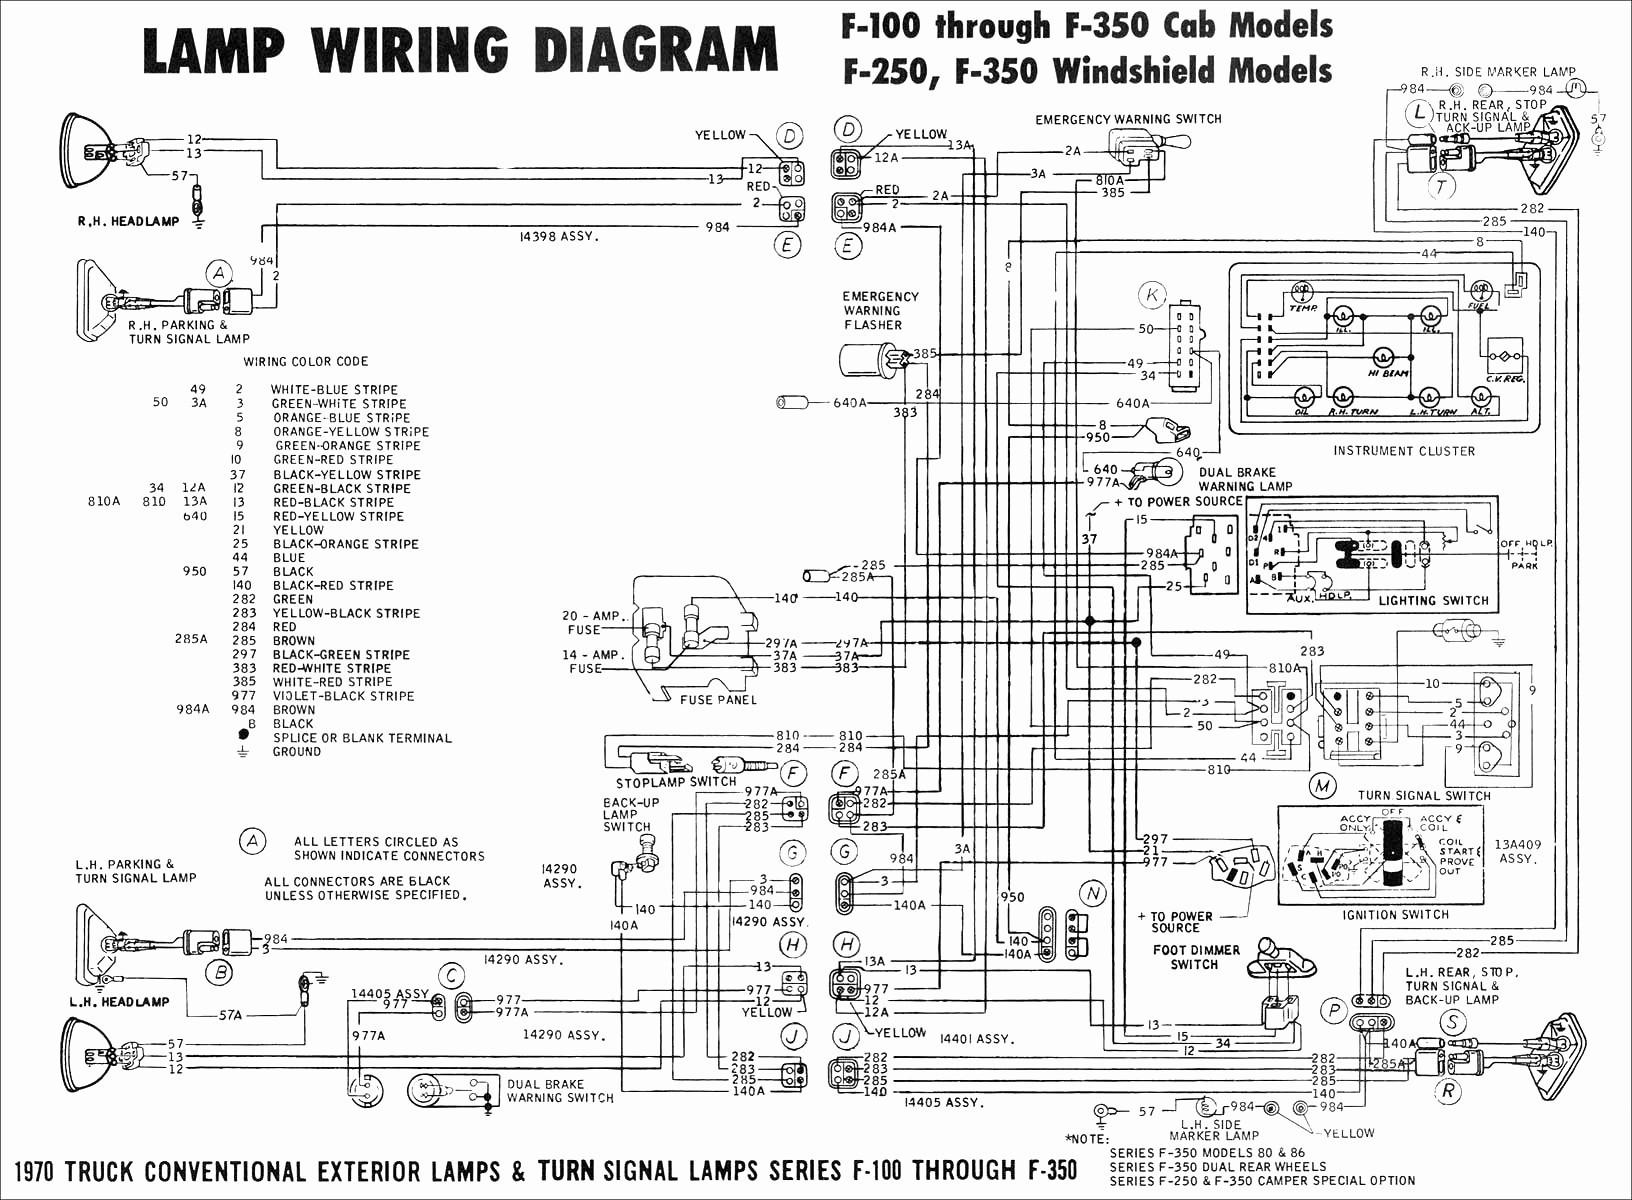 Bmw 318i Engine Diagram Bmw M60 Engine Wiring Harness Diagram Likewise Bmw M60 Engine Of Bmw 318i Engine Diagram Sundowner Wiring Diagram Wiring Diagram Datasource